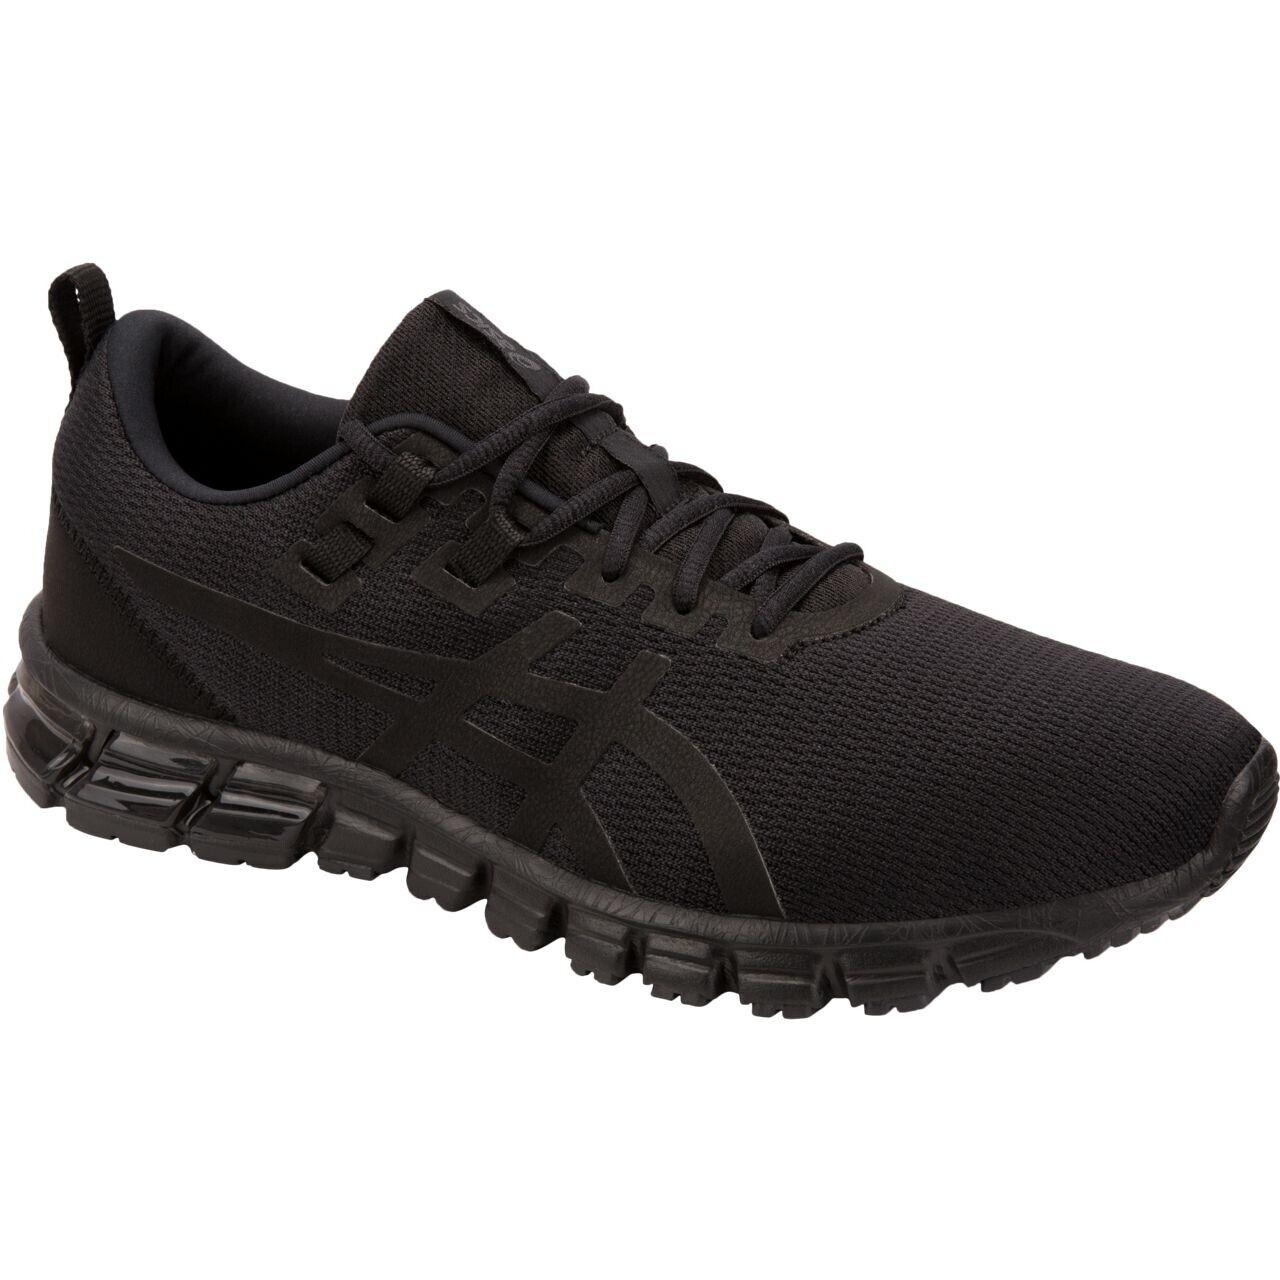 ASICS GEL-Quantum 90 Zapato-Hombre Para Correr-Negro - 1021A123.001